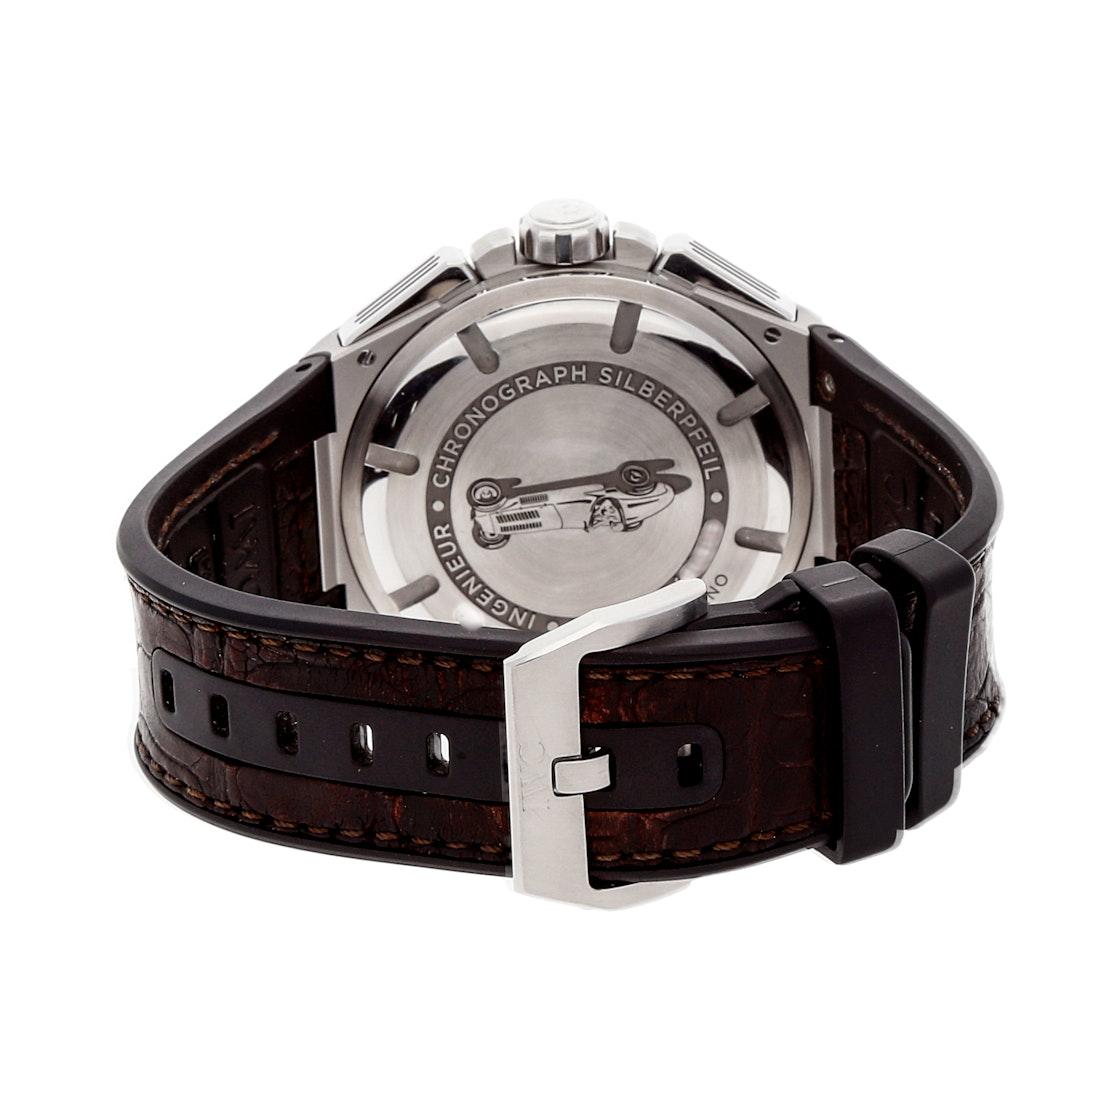 IWC Ingenieur Silberpfeil Chronograph IW3785-11